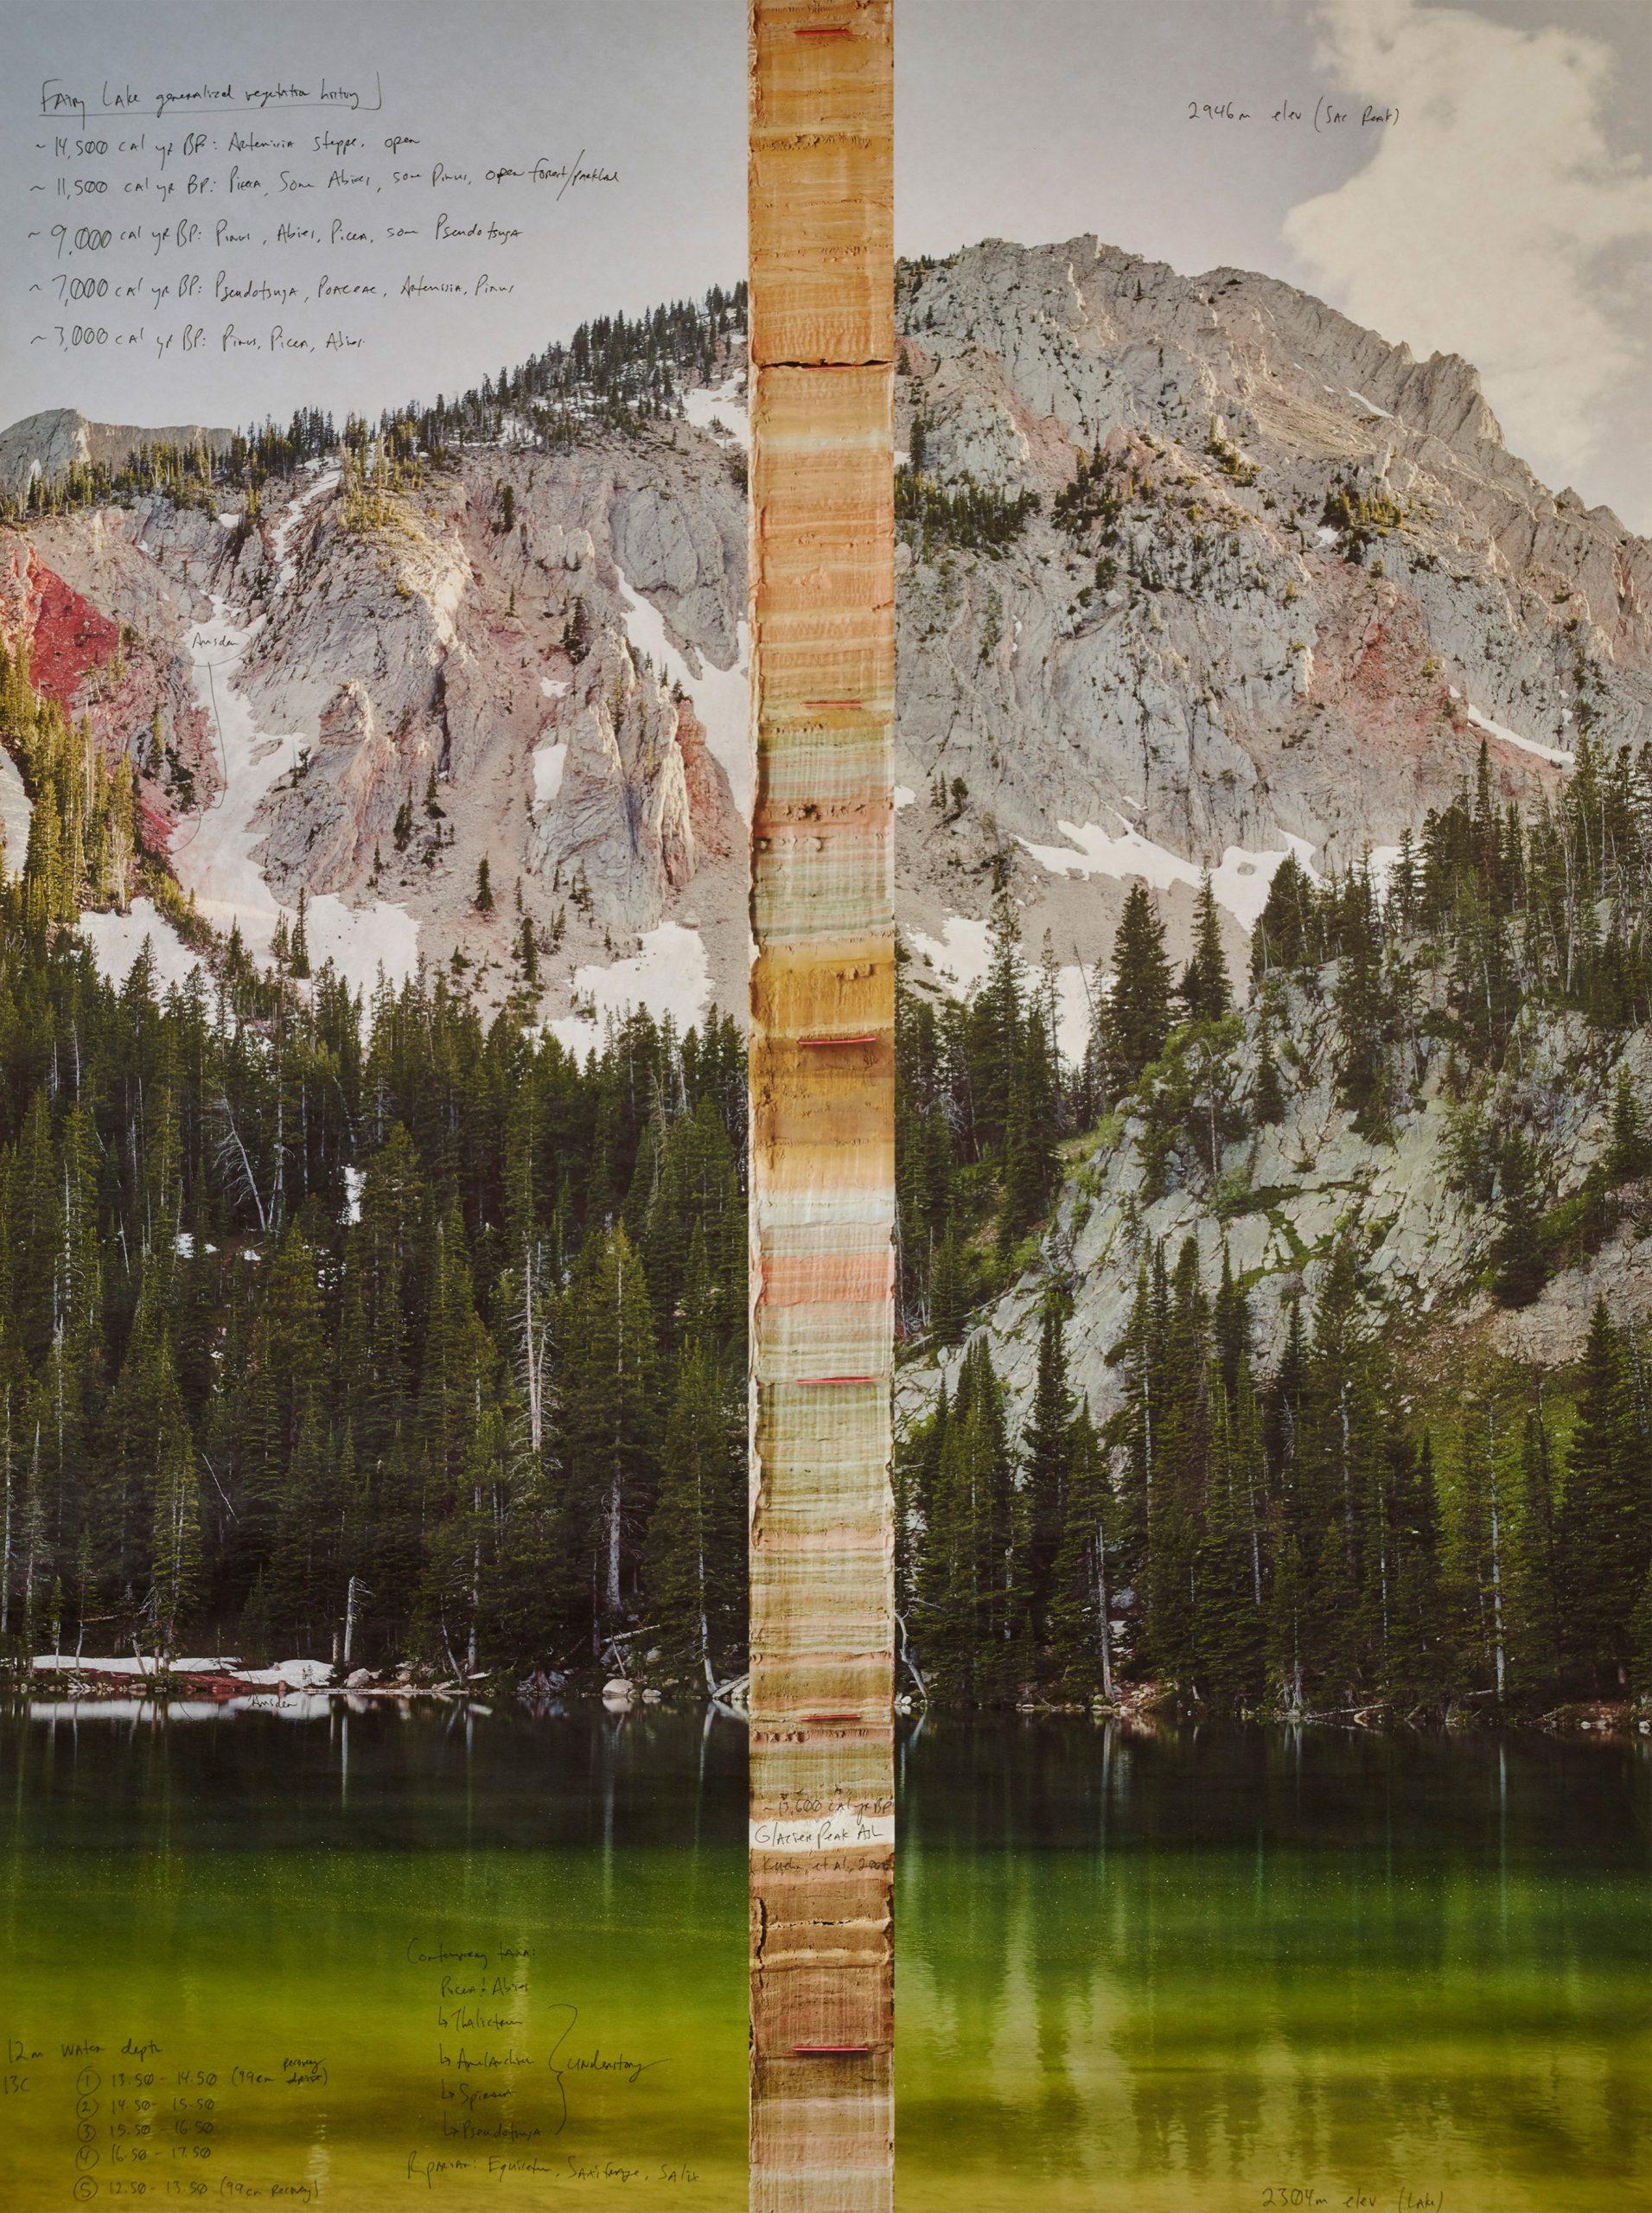 Fairy Lake Mudcore